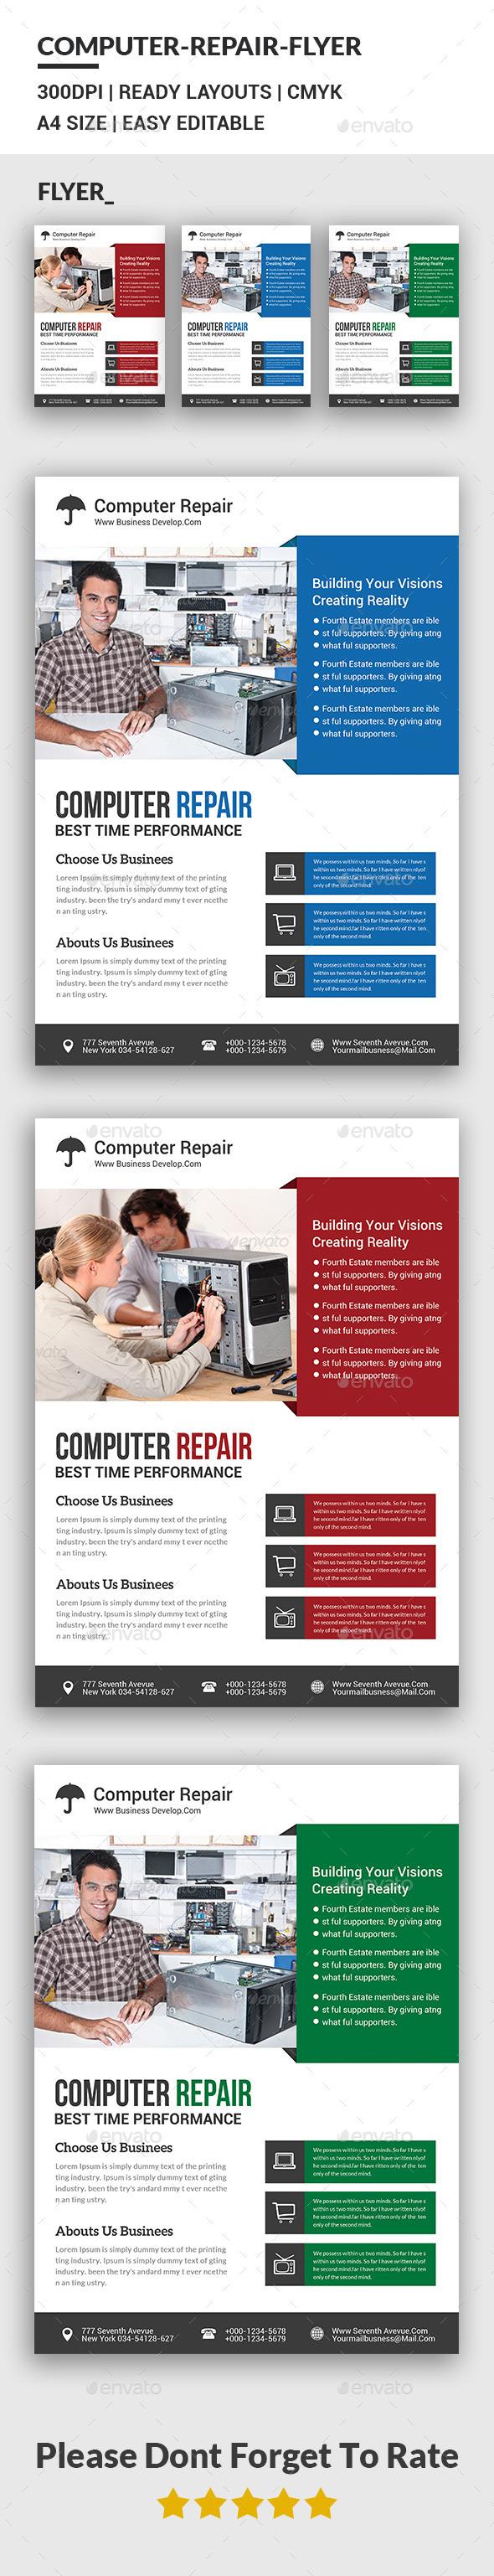 computer repair flier